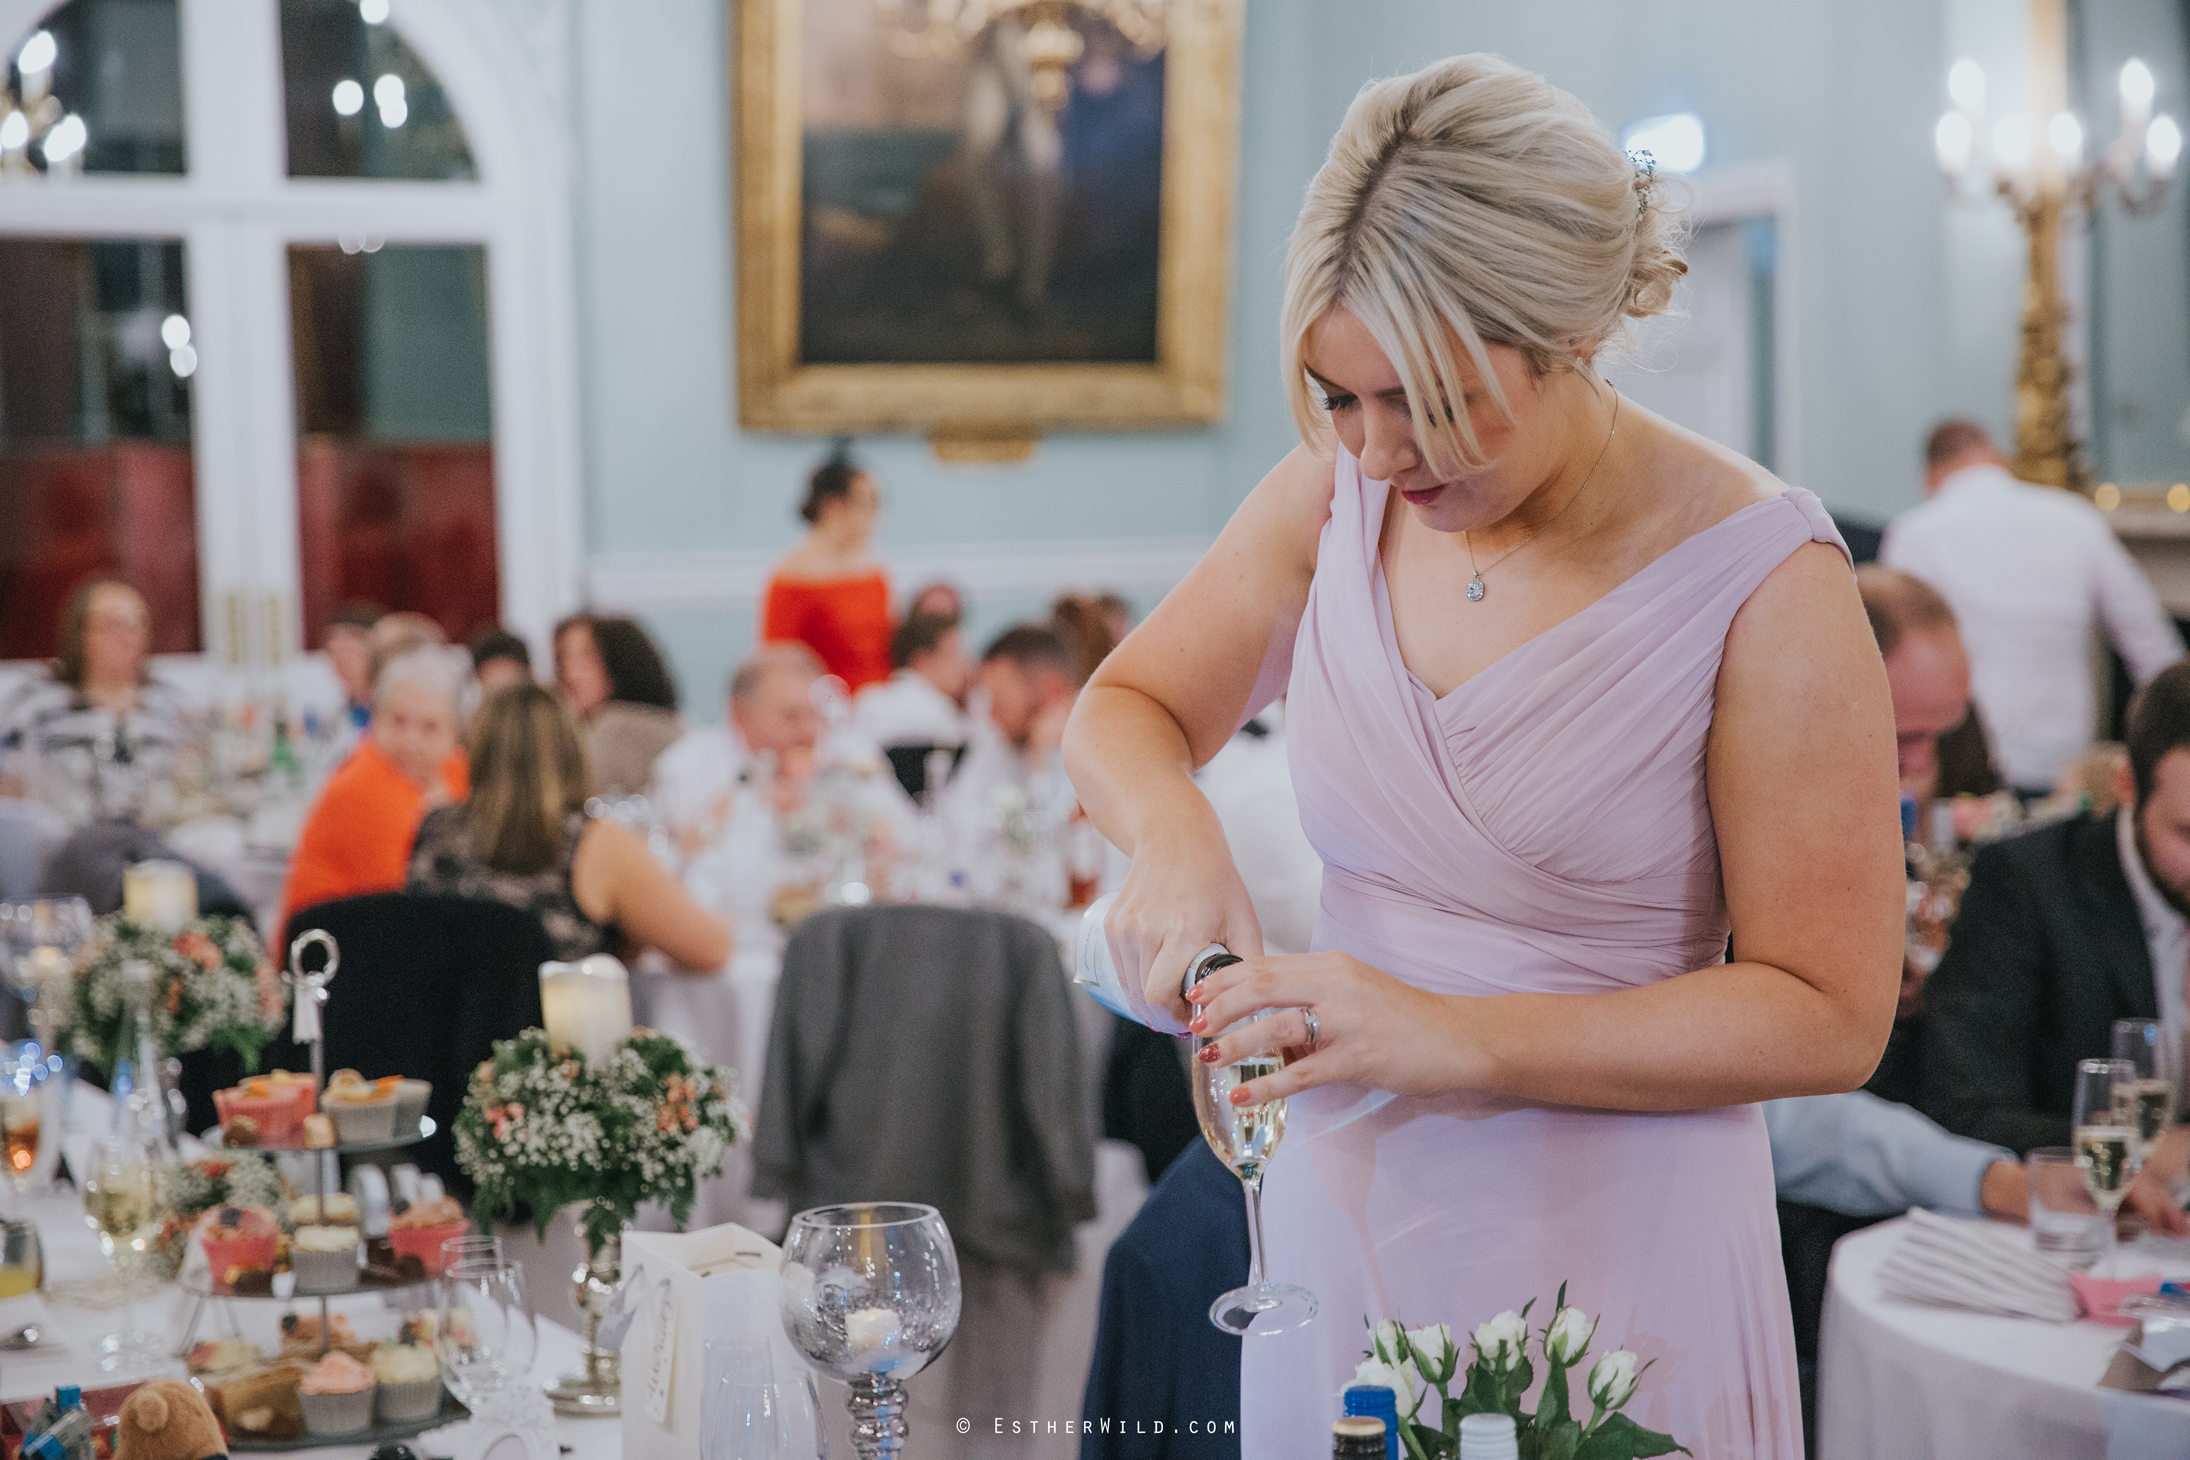 Wedding_Kings_Lynn_Town_Hall_Norfolk_Photographer_Esther_Wild_IMG_1687_IMGL0411.jpg